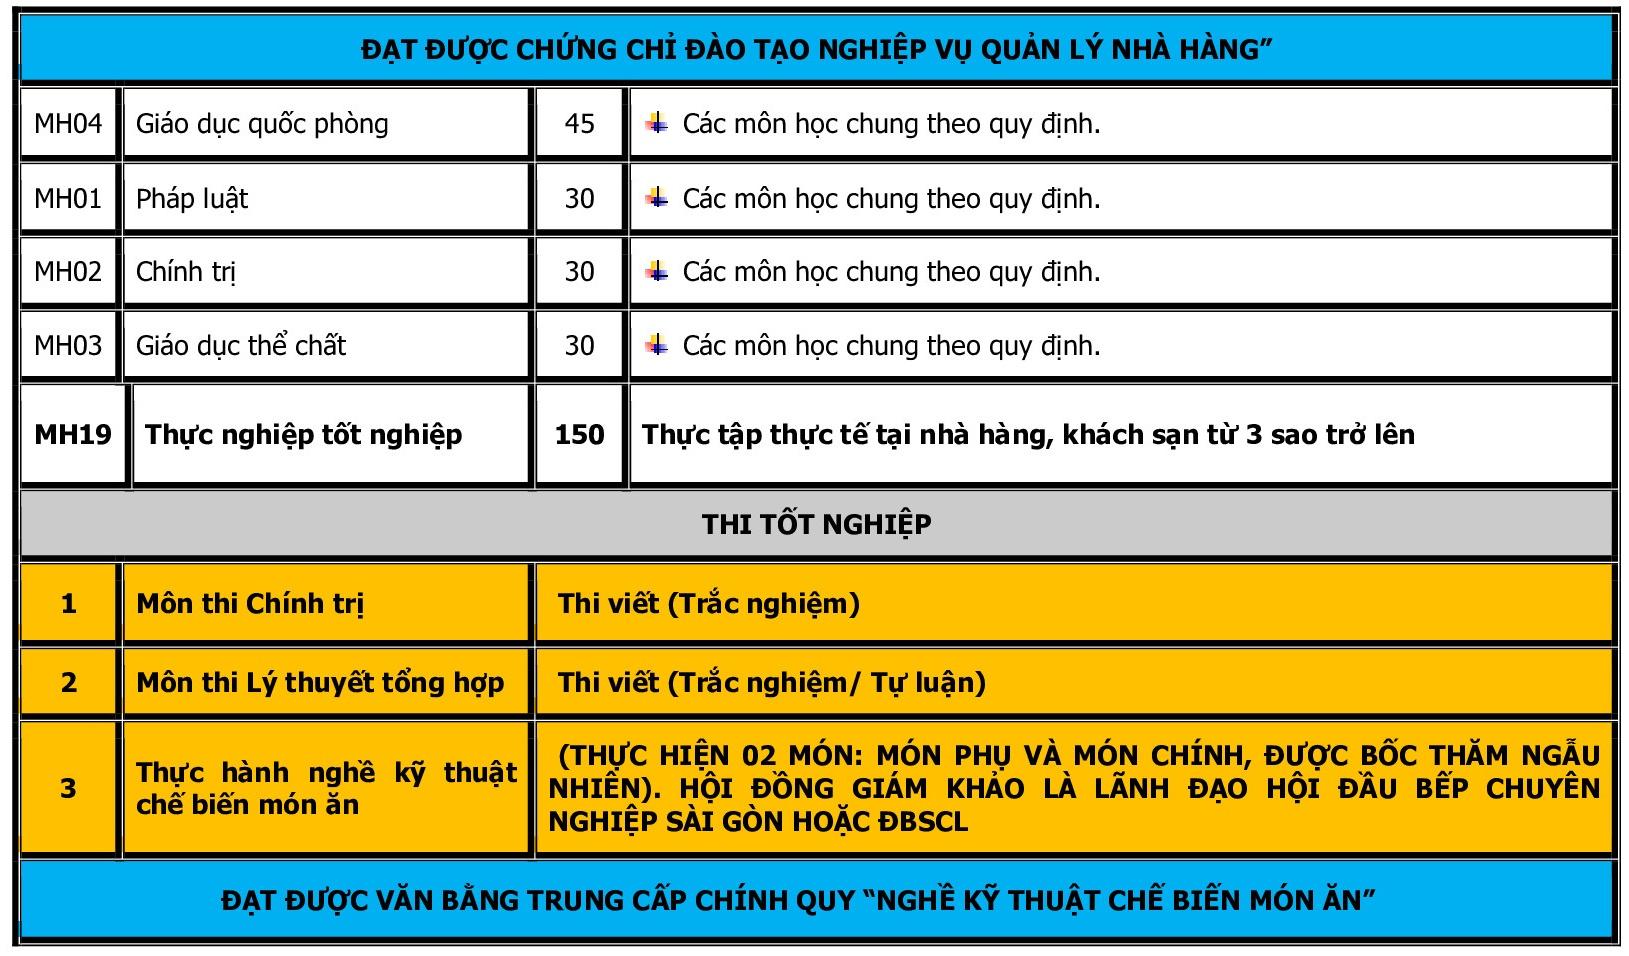 CHUONG TRINH TRUNG CAP - KTCBMA 2020_p005